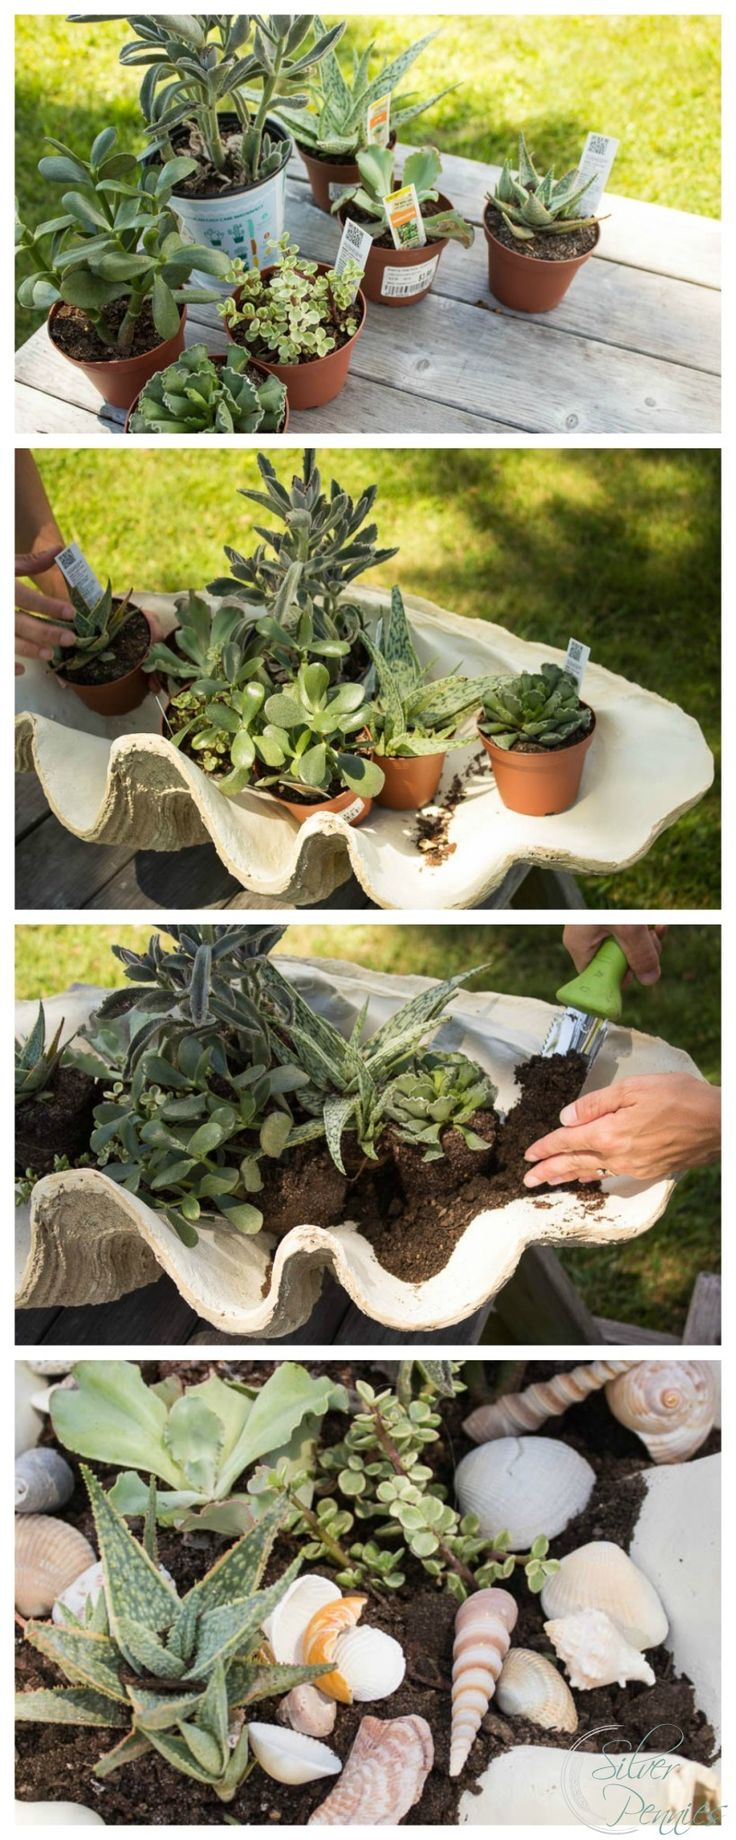 Steps for Creating a DIY Succulent Planter #sponsored